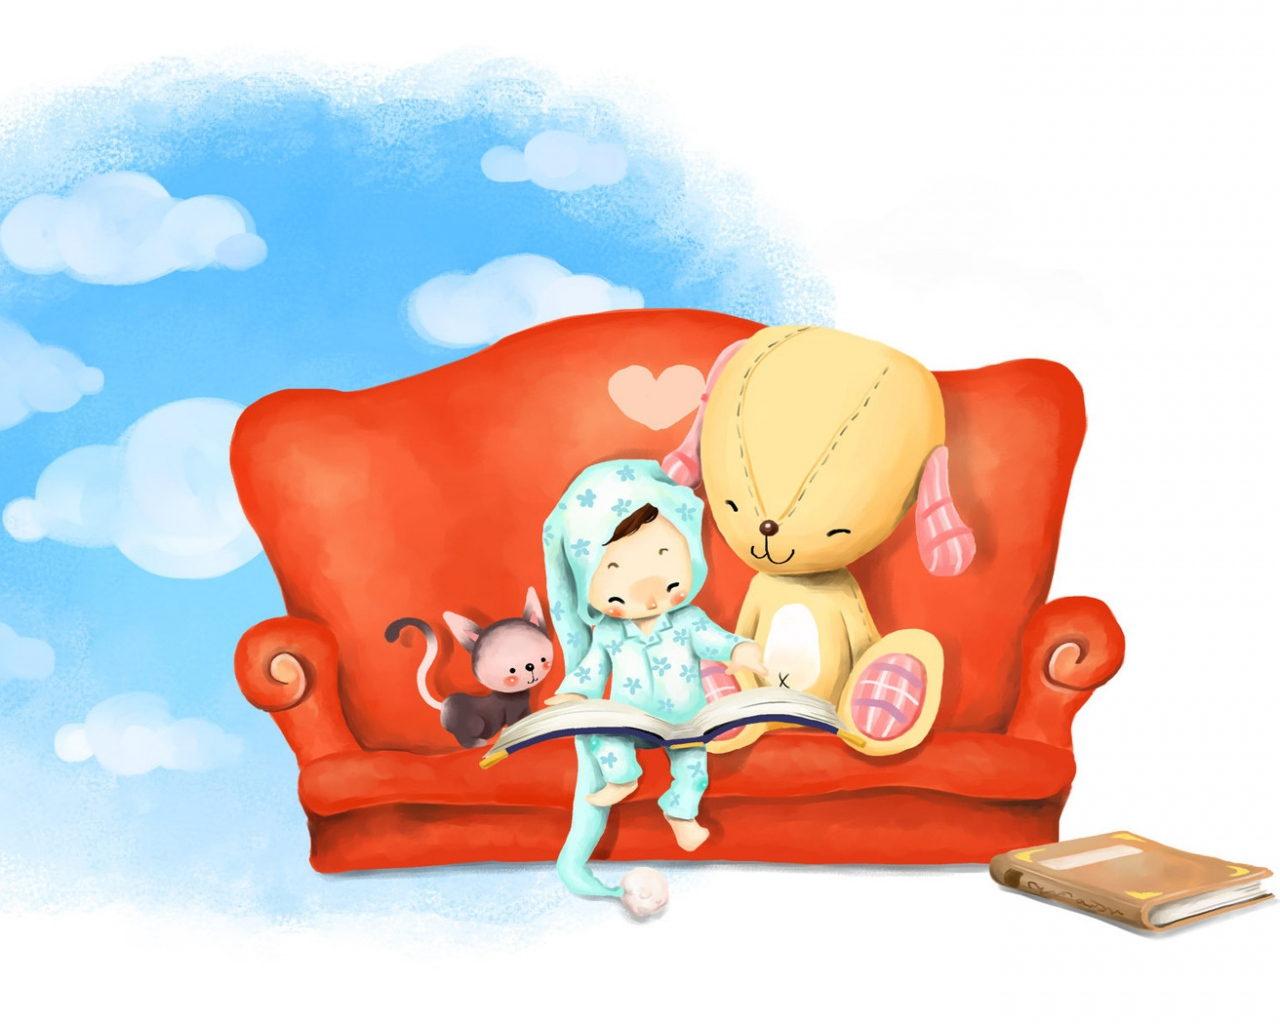 book_sky_sofa_rabbit_toy_leisure_54101_1280x1024